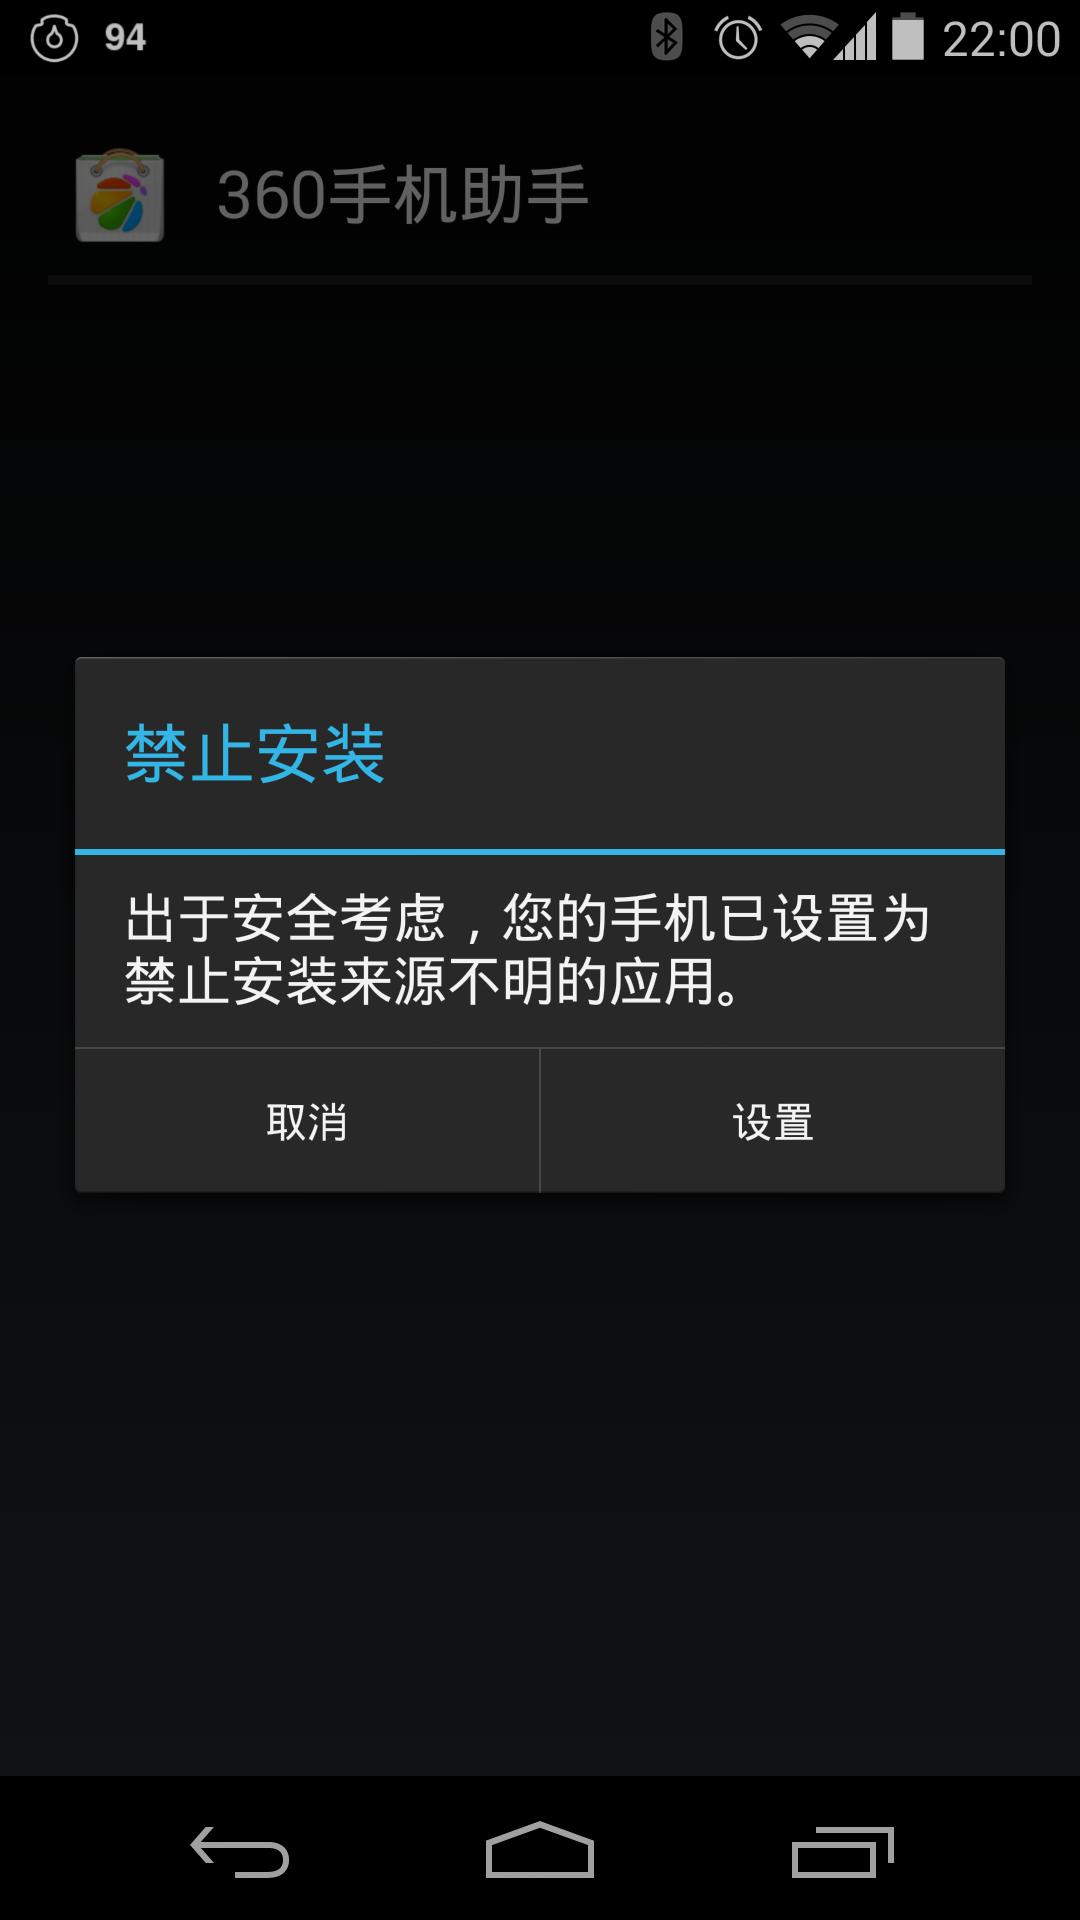 Screenshot_2014-03-23-22-00-07